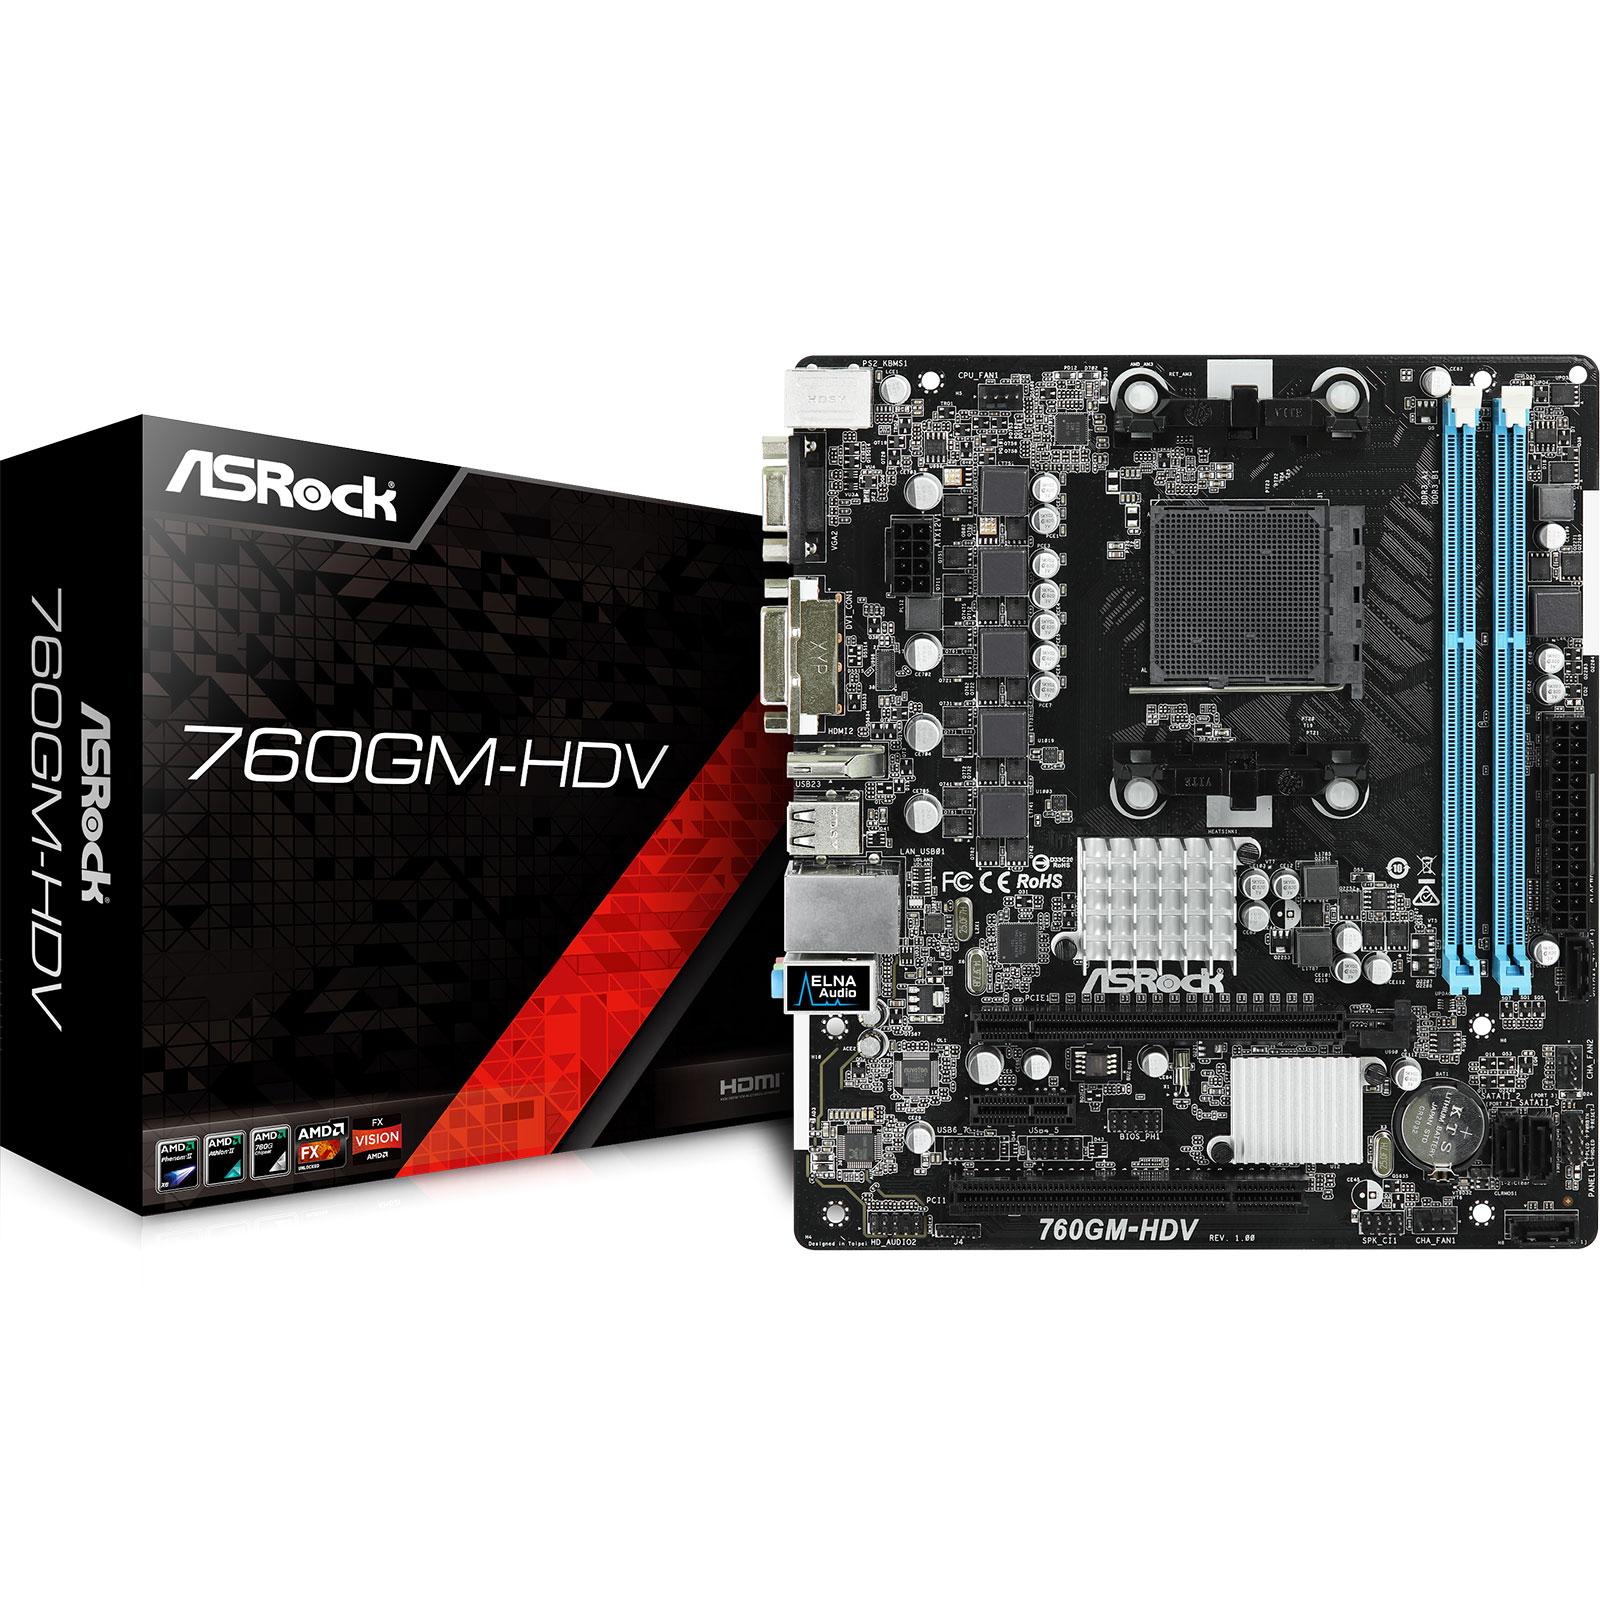 Carte mère ASRock 760GM-HDV Carte mère micro-ATX Socket AM3/AM3+ AMD 760G - AMD Radeon HD 3000 - SATA 3Gbit/s - USB 2.0 - 1 x PCI Express 2.0 16x